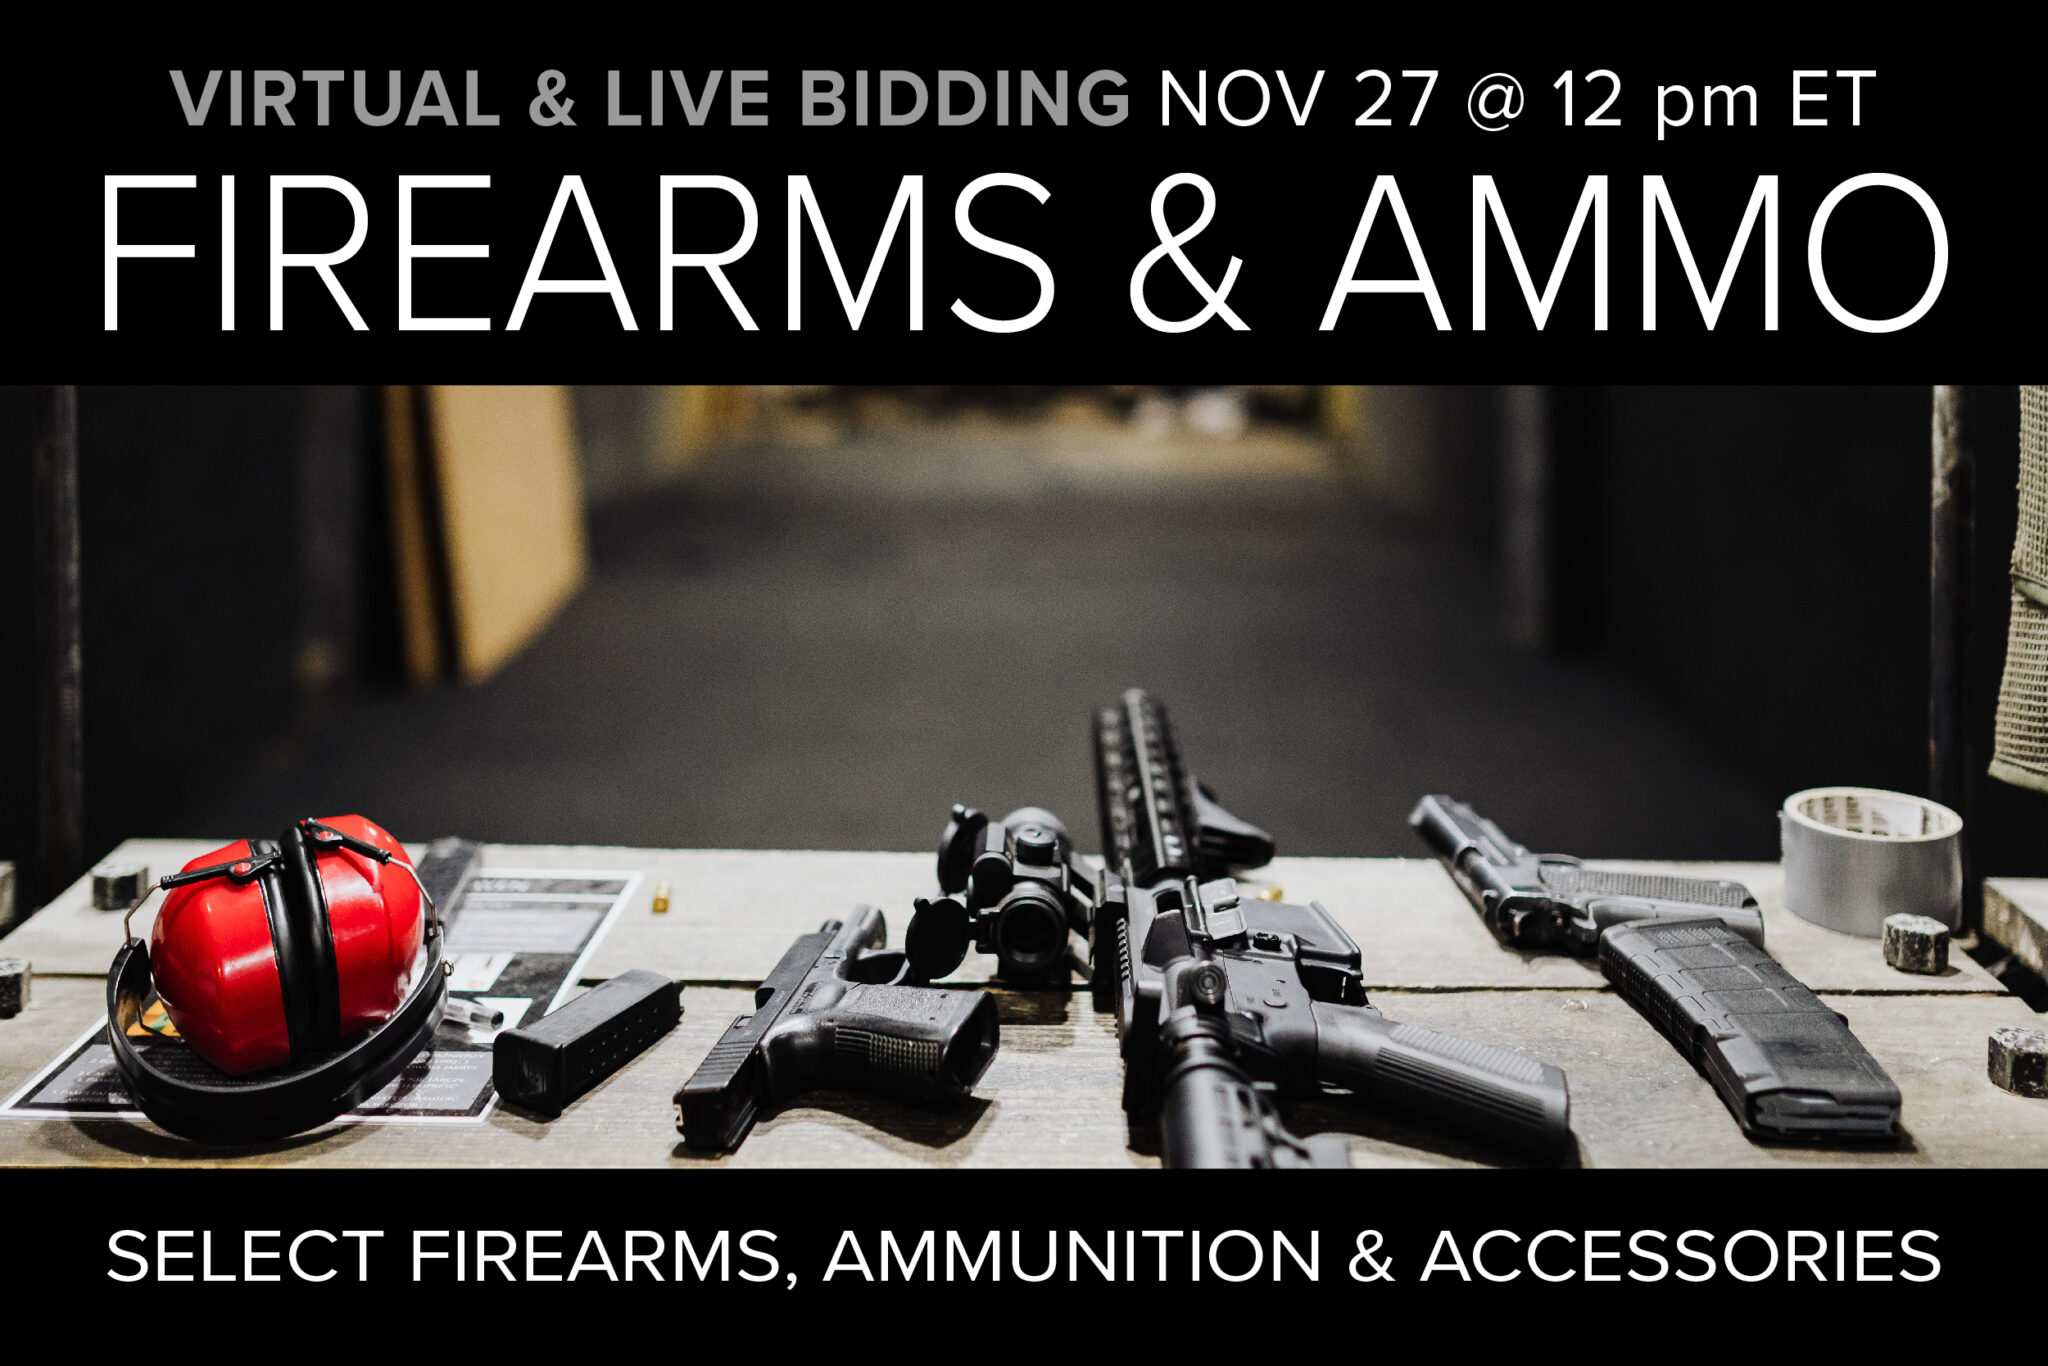 November Firearms & Ammo Auction